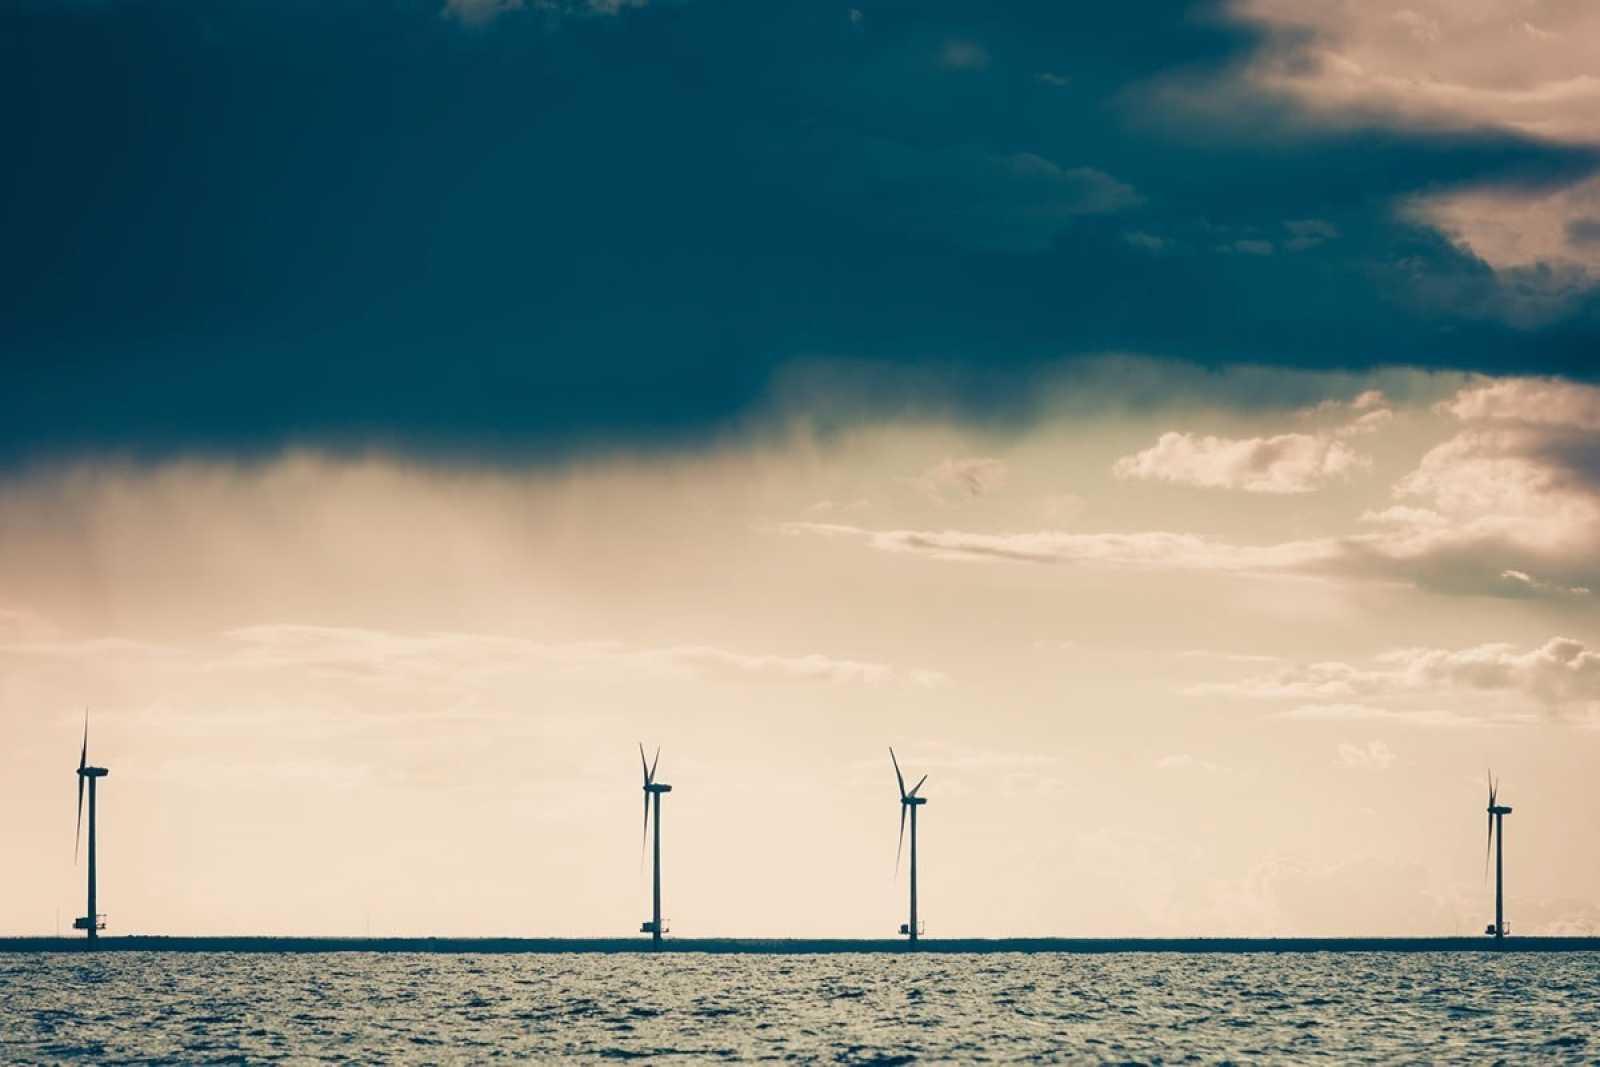 Wind farms 75nknla3l